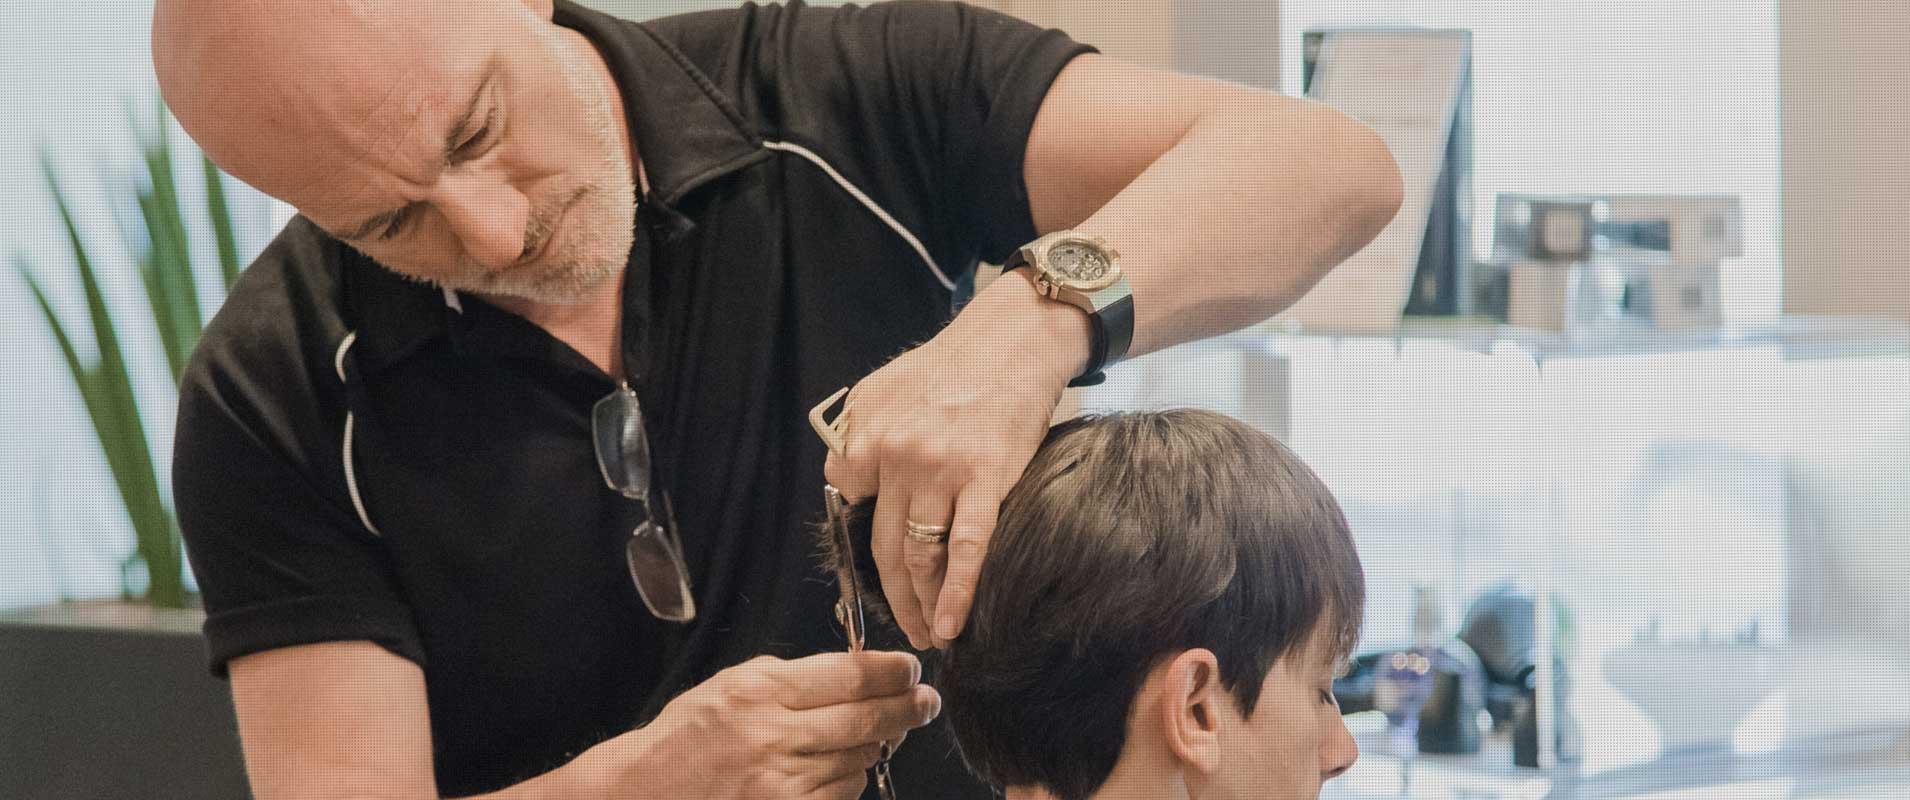 Enzo Casillo parrucchiere Como